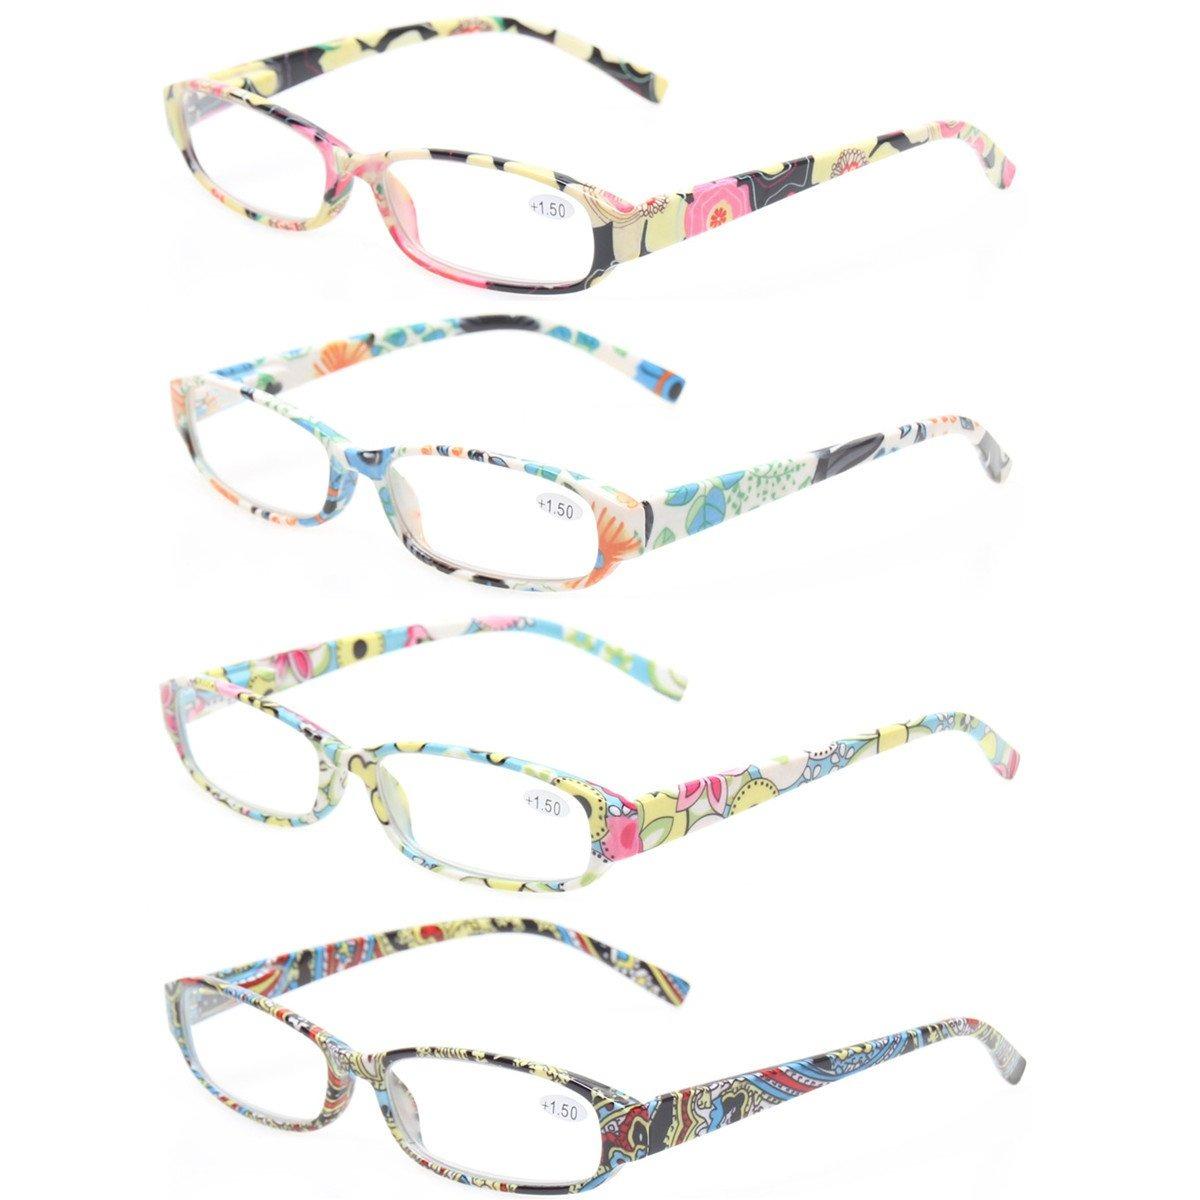 e1b1155bf0 gafas de lectura 4 gafas de mujer de moda con diseño flor. Cargando zoom.